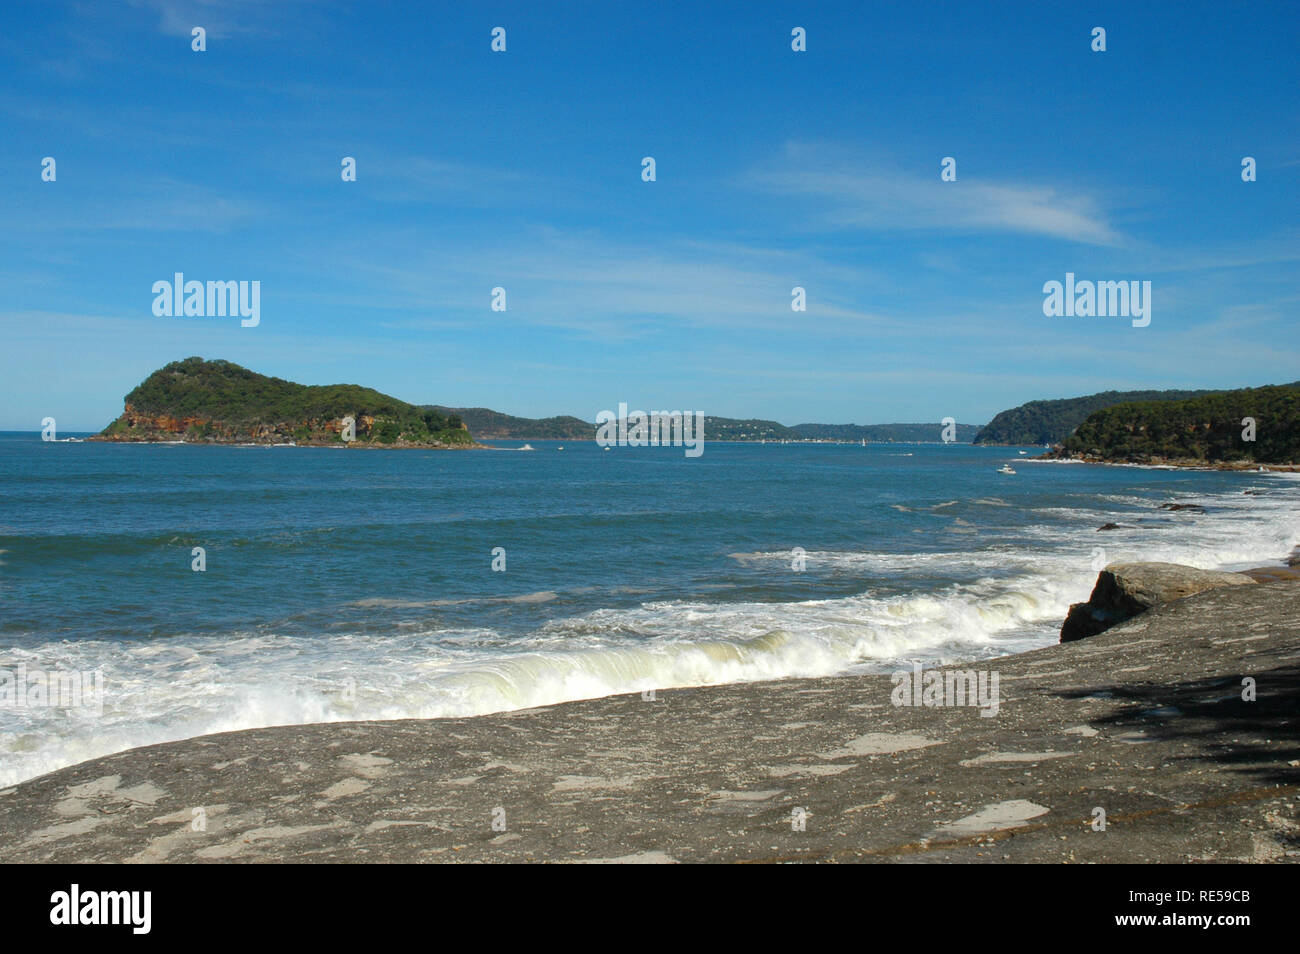 Lion Island, Broken Bay, New South Wales, Australia - Stock Image